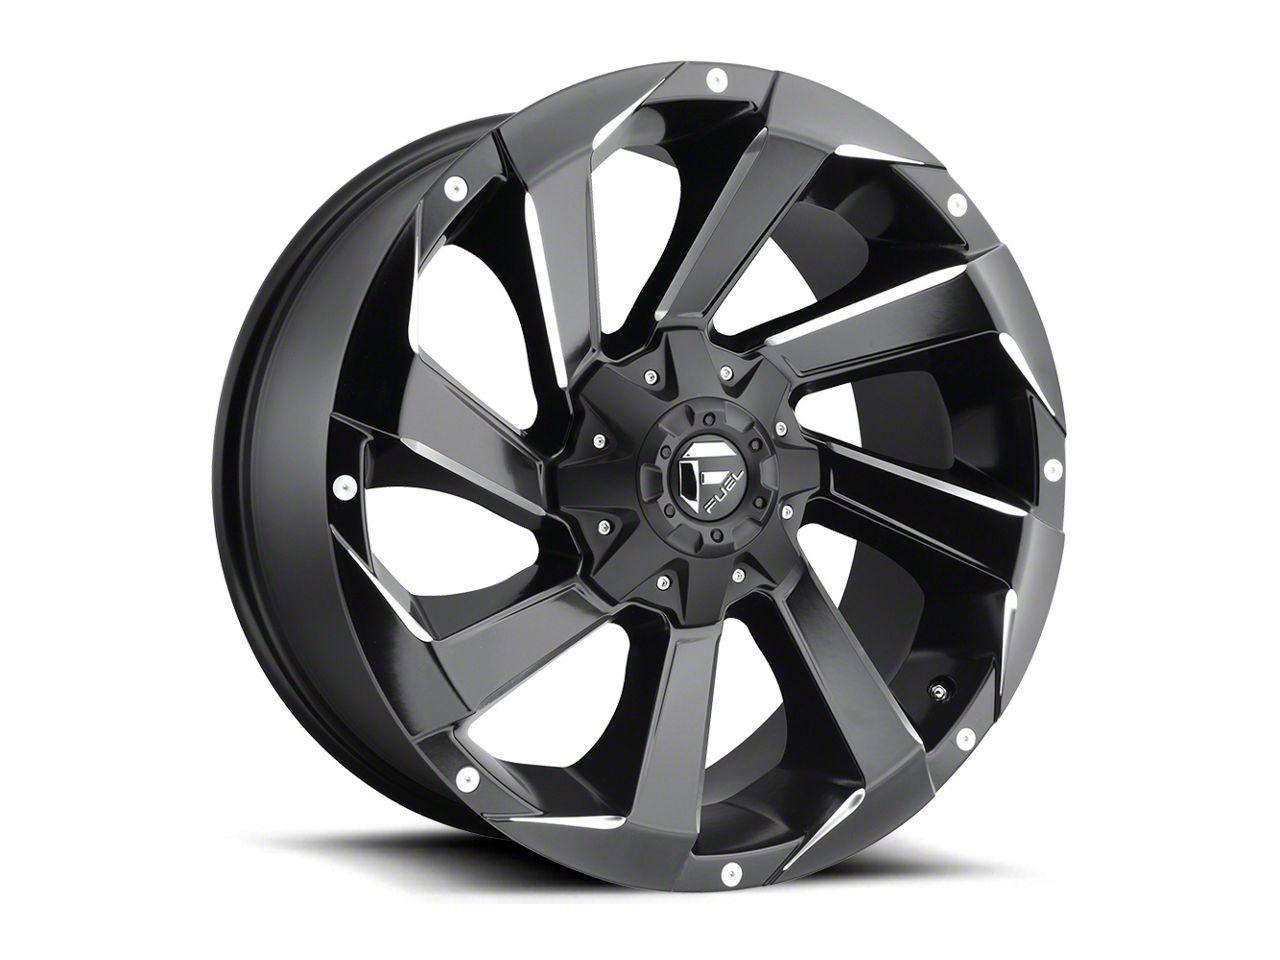 Fuel Wheels Razor Matte Black Milled 5-Lug Wheel - 18x9 (02-18 RAM 1500, Excluding Mega Cab)